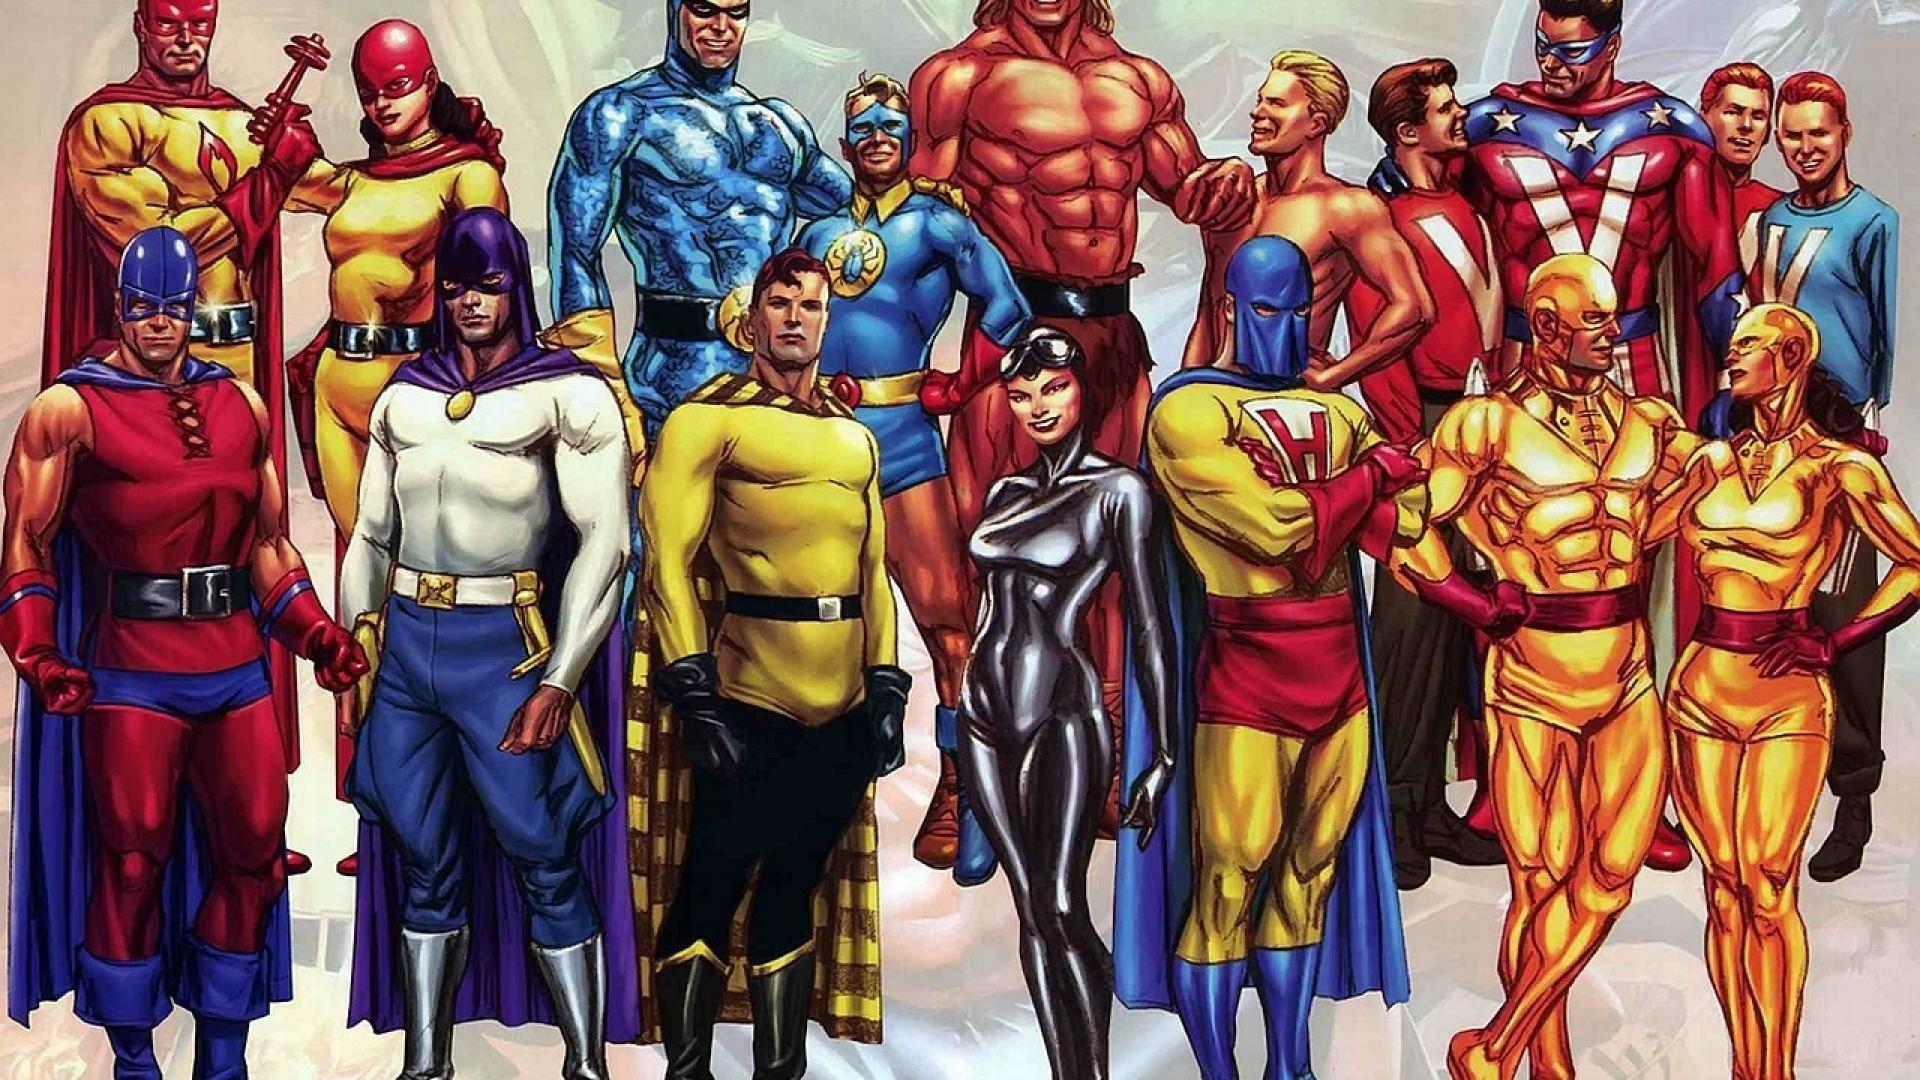 Justice League Comic Wallpaper